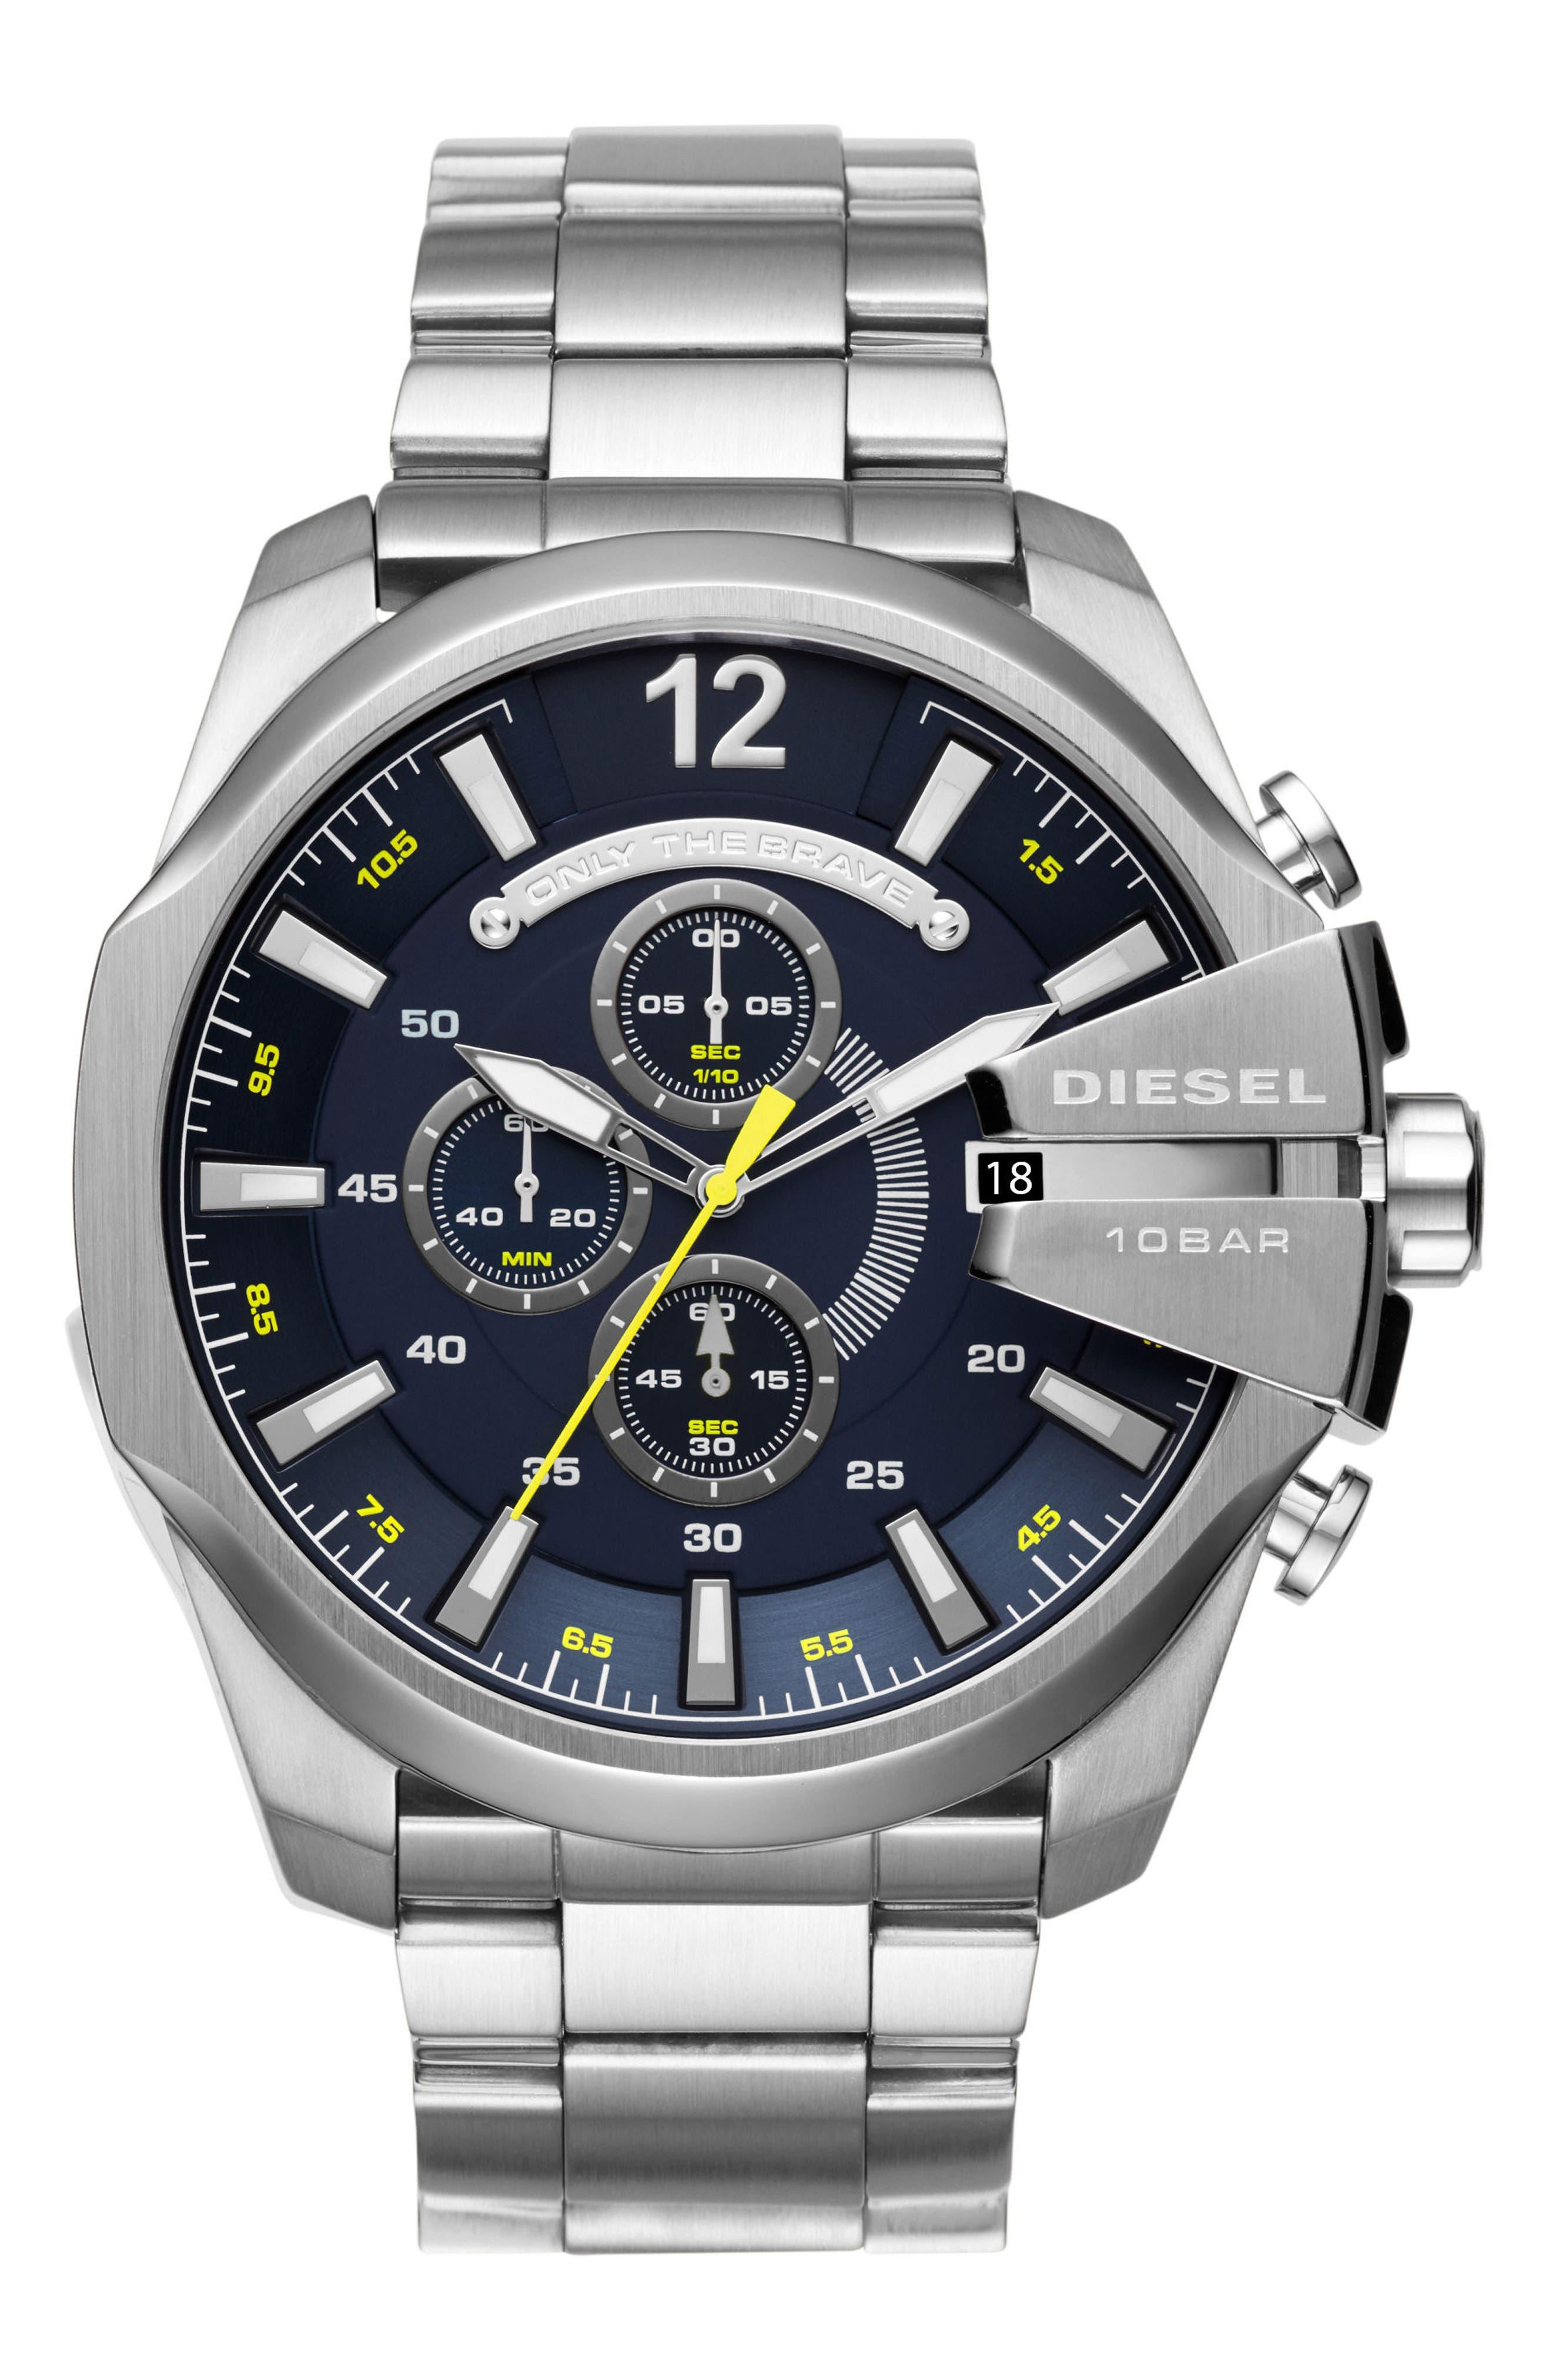 Main Image - DIESEL® Mega Chief Chronograph Bracelet Watch, 51mm x 59mm